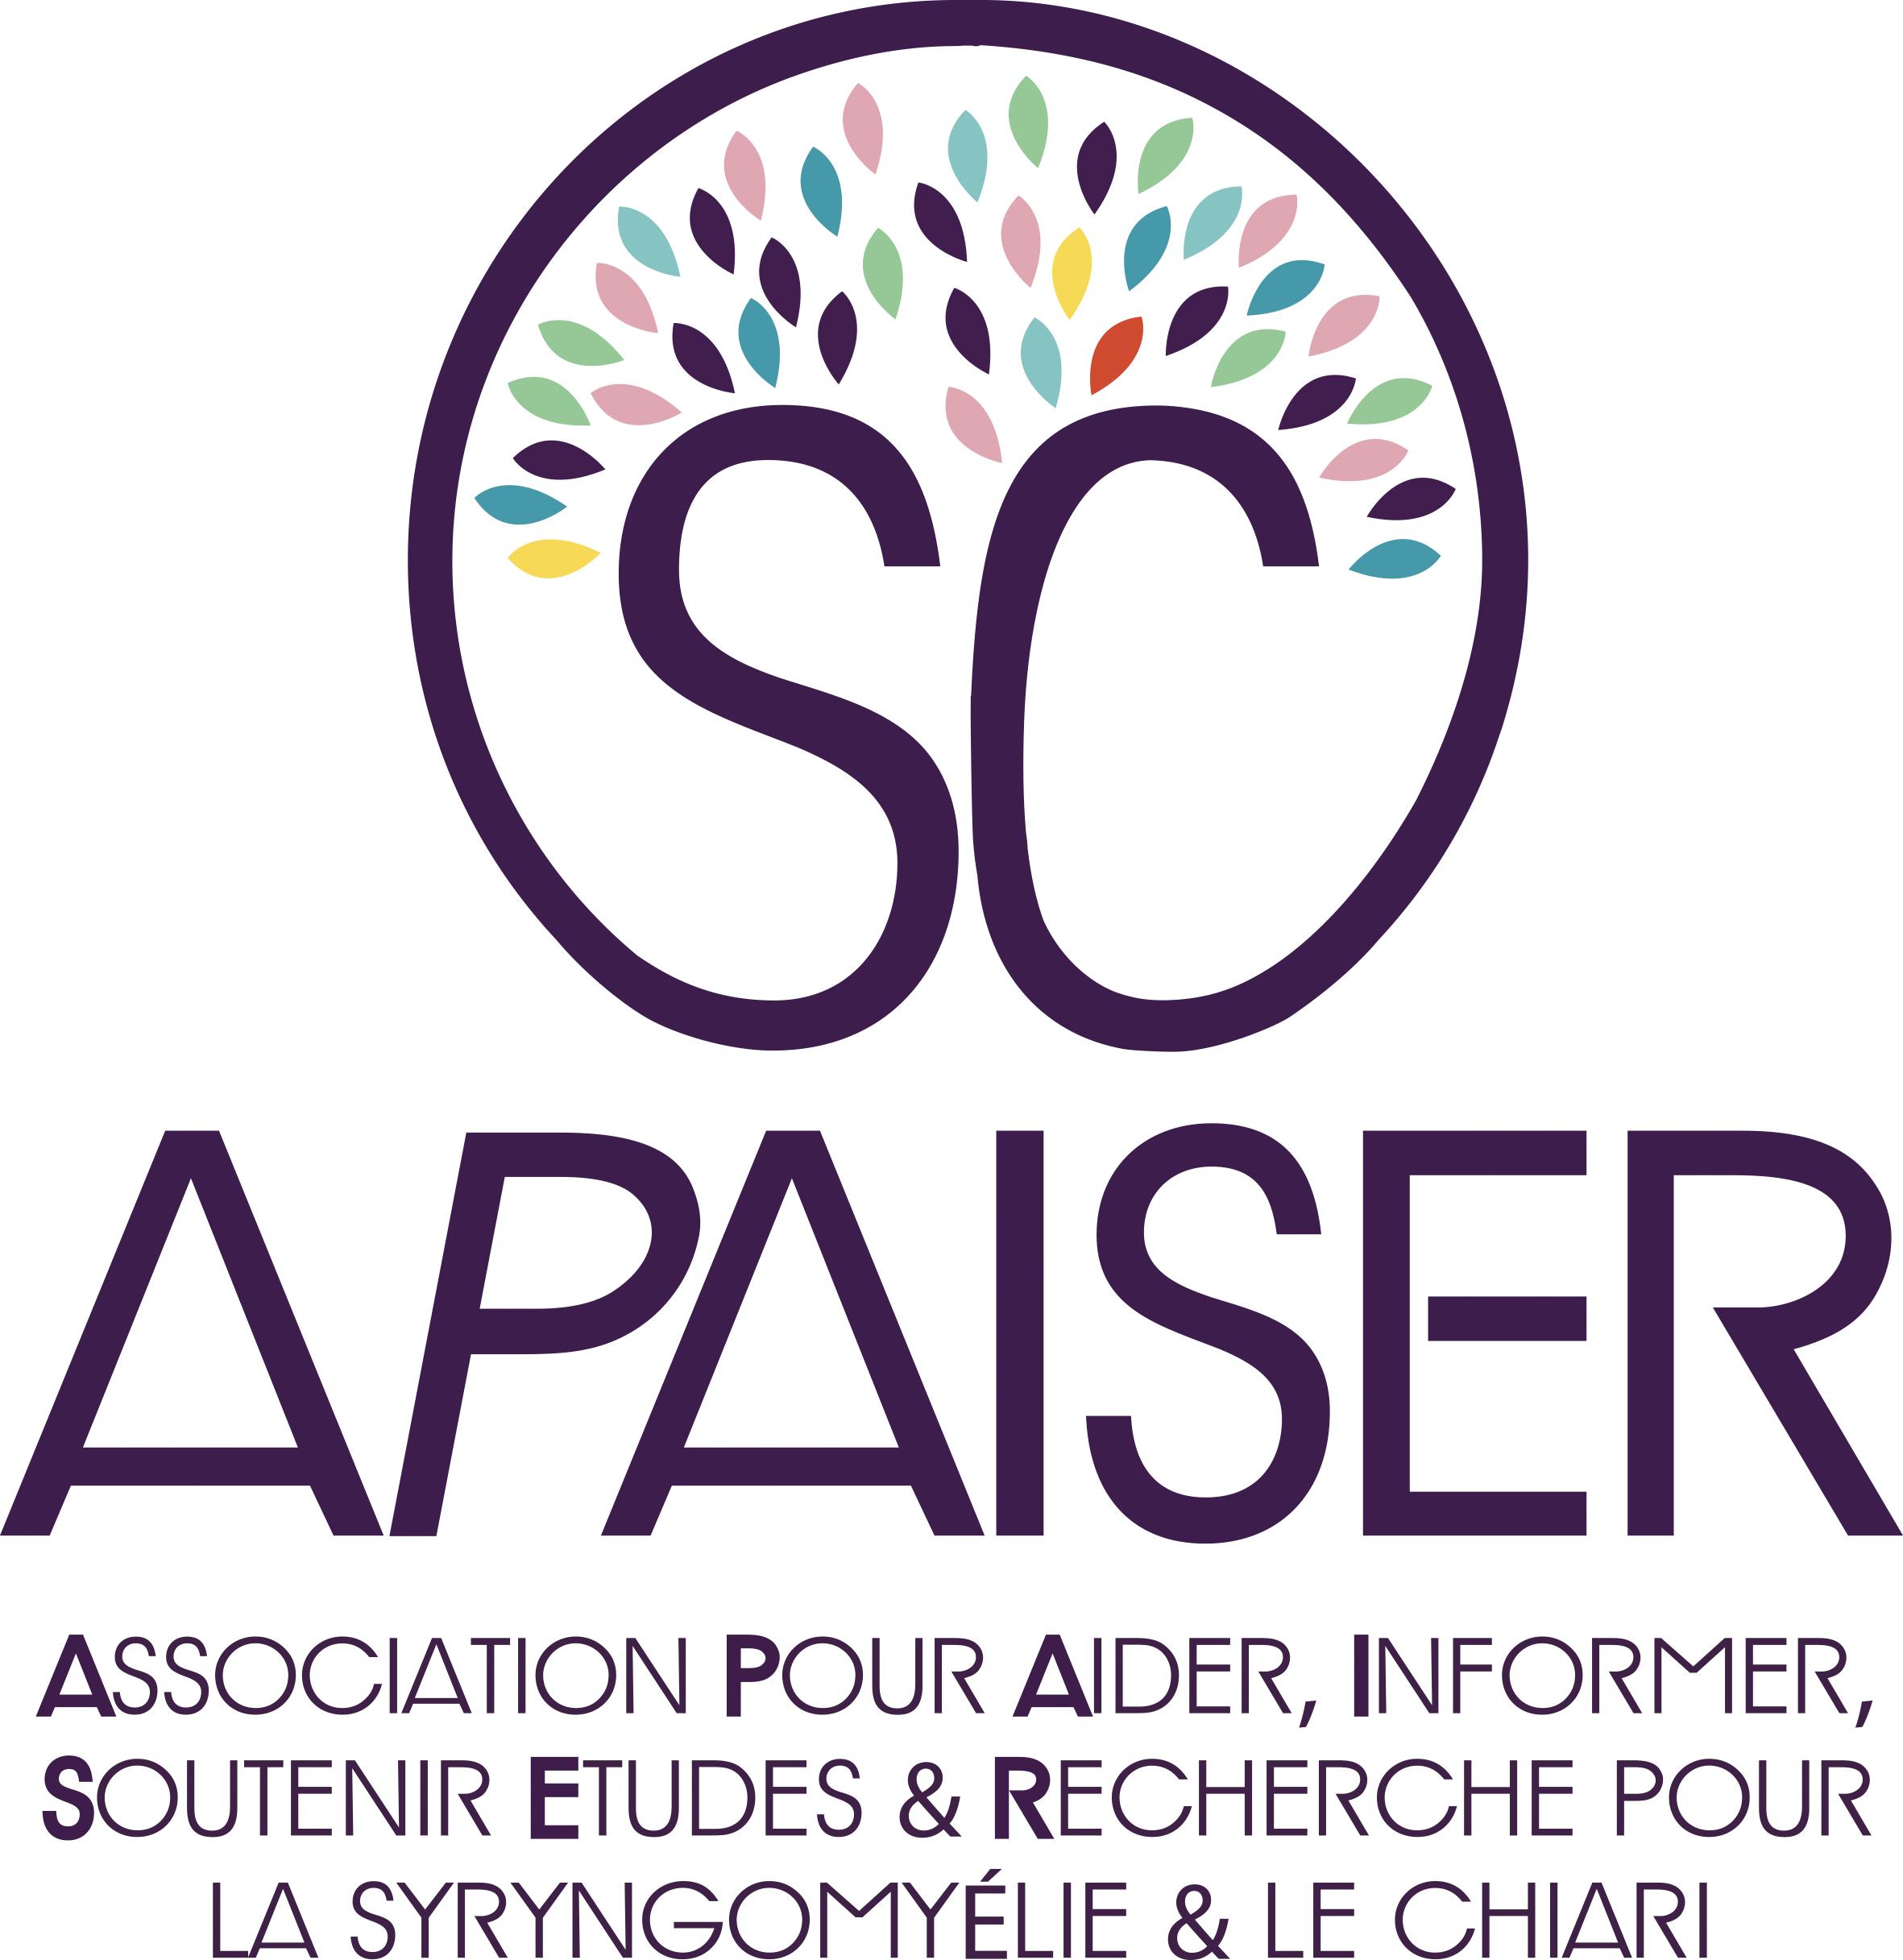 Association - APAISER